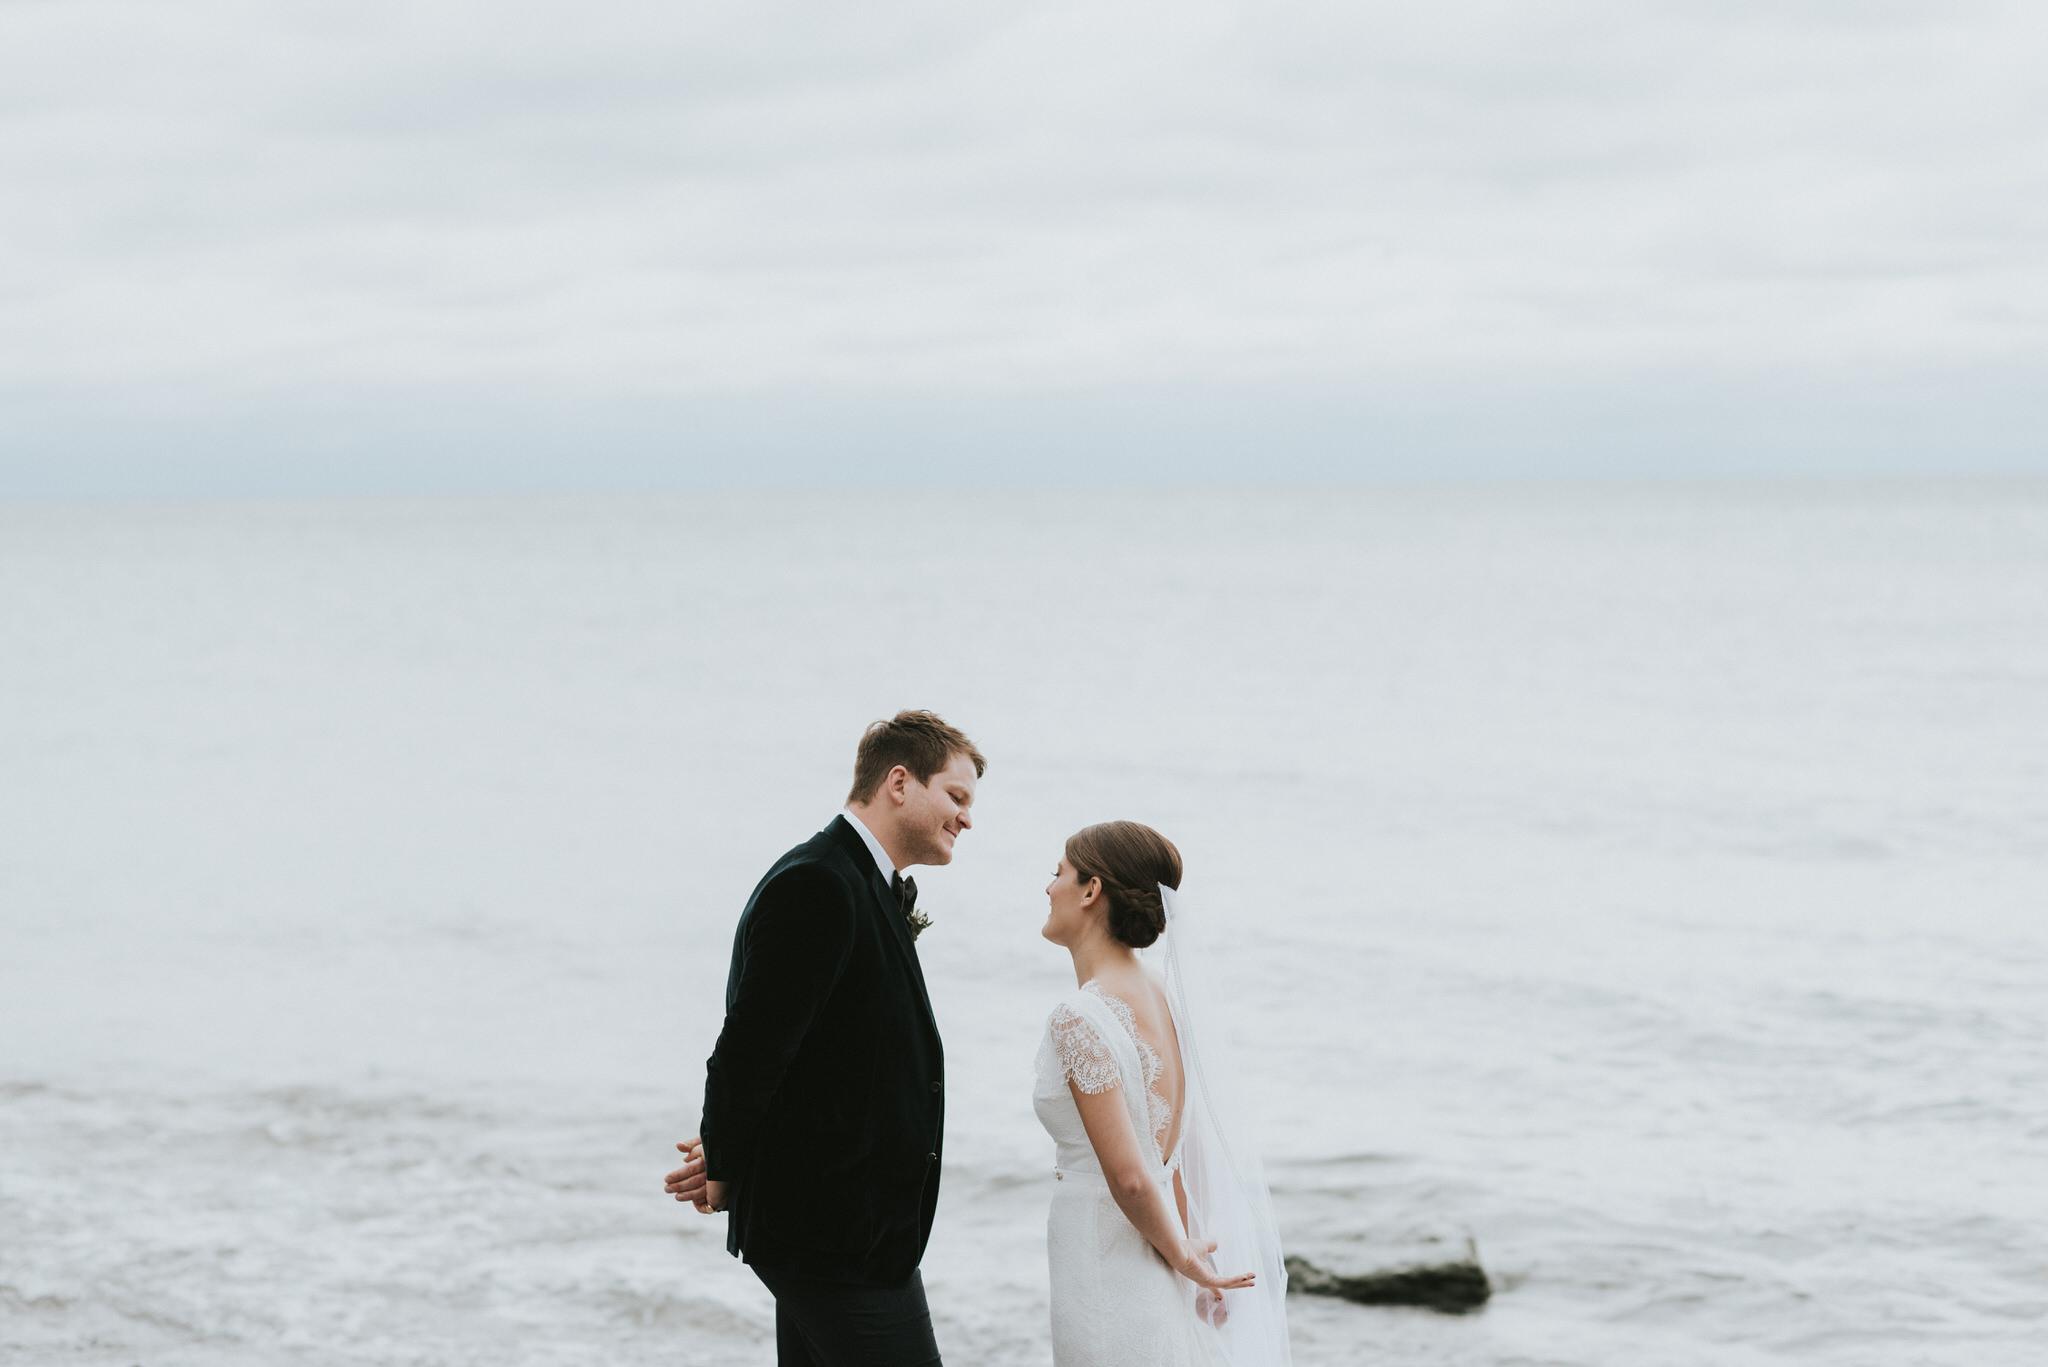 scarletoneillphotography_weddingphotography_prince edward county weddings039.JPG